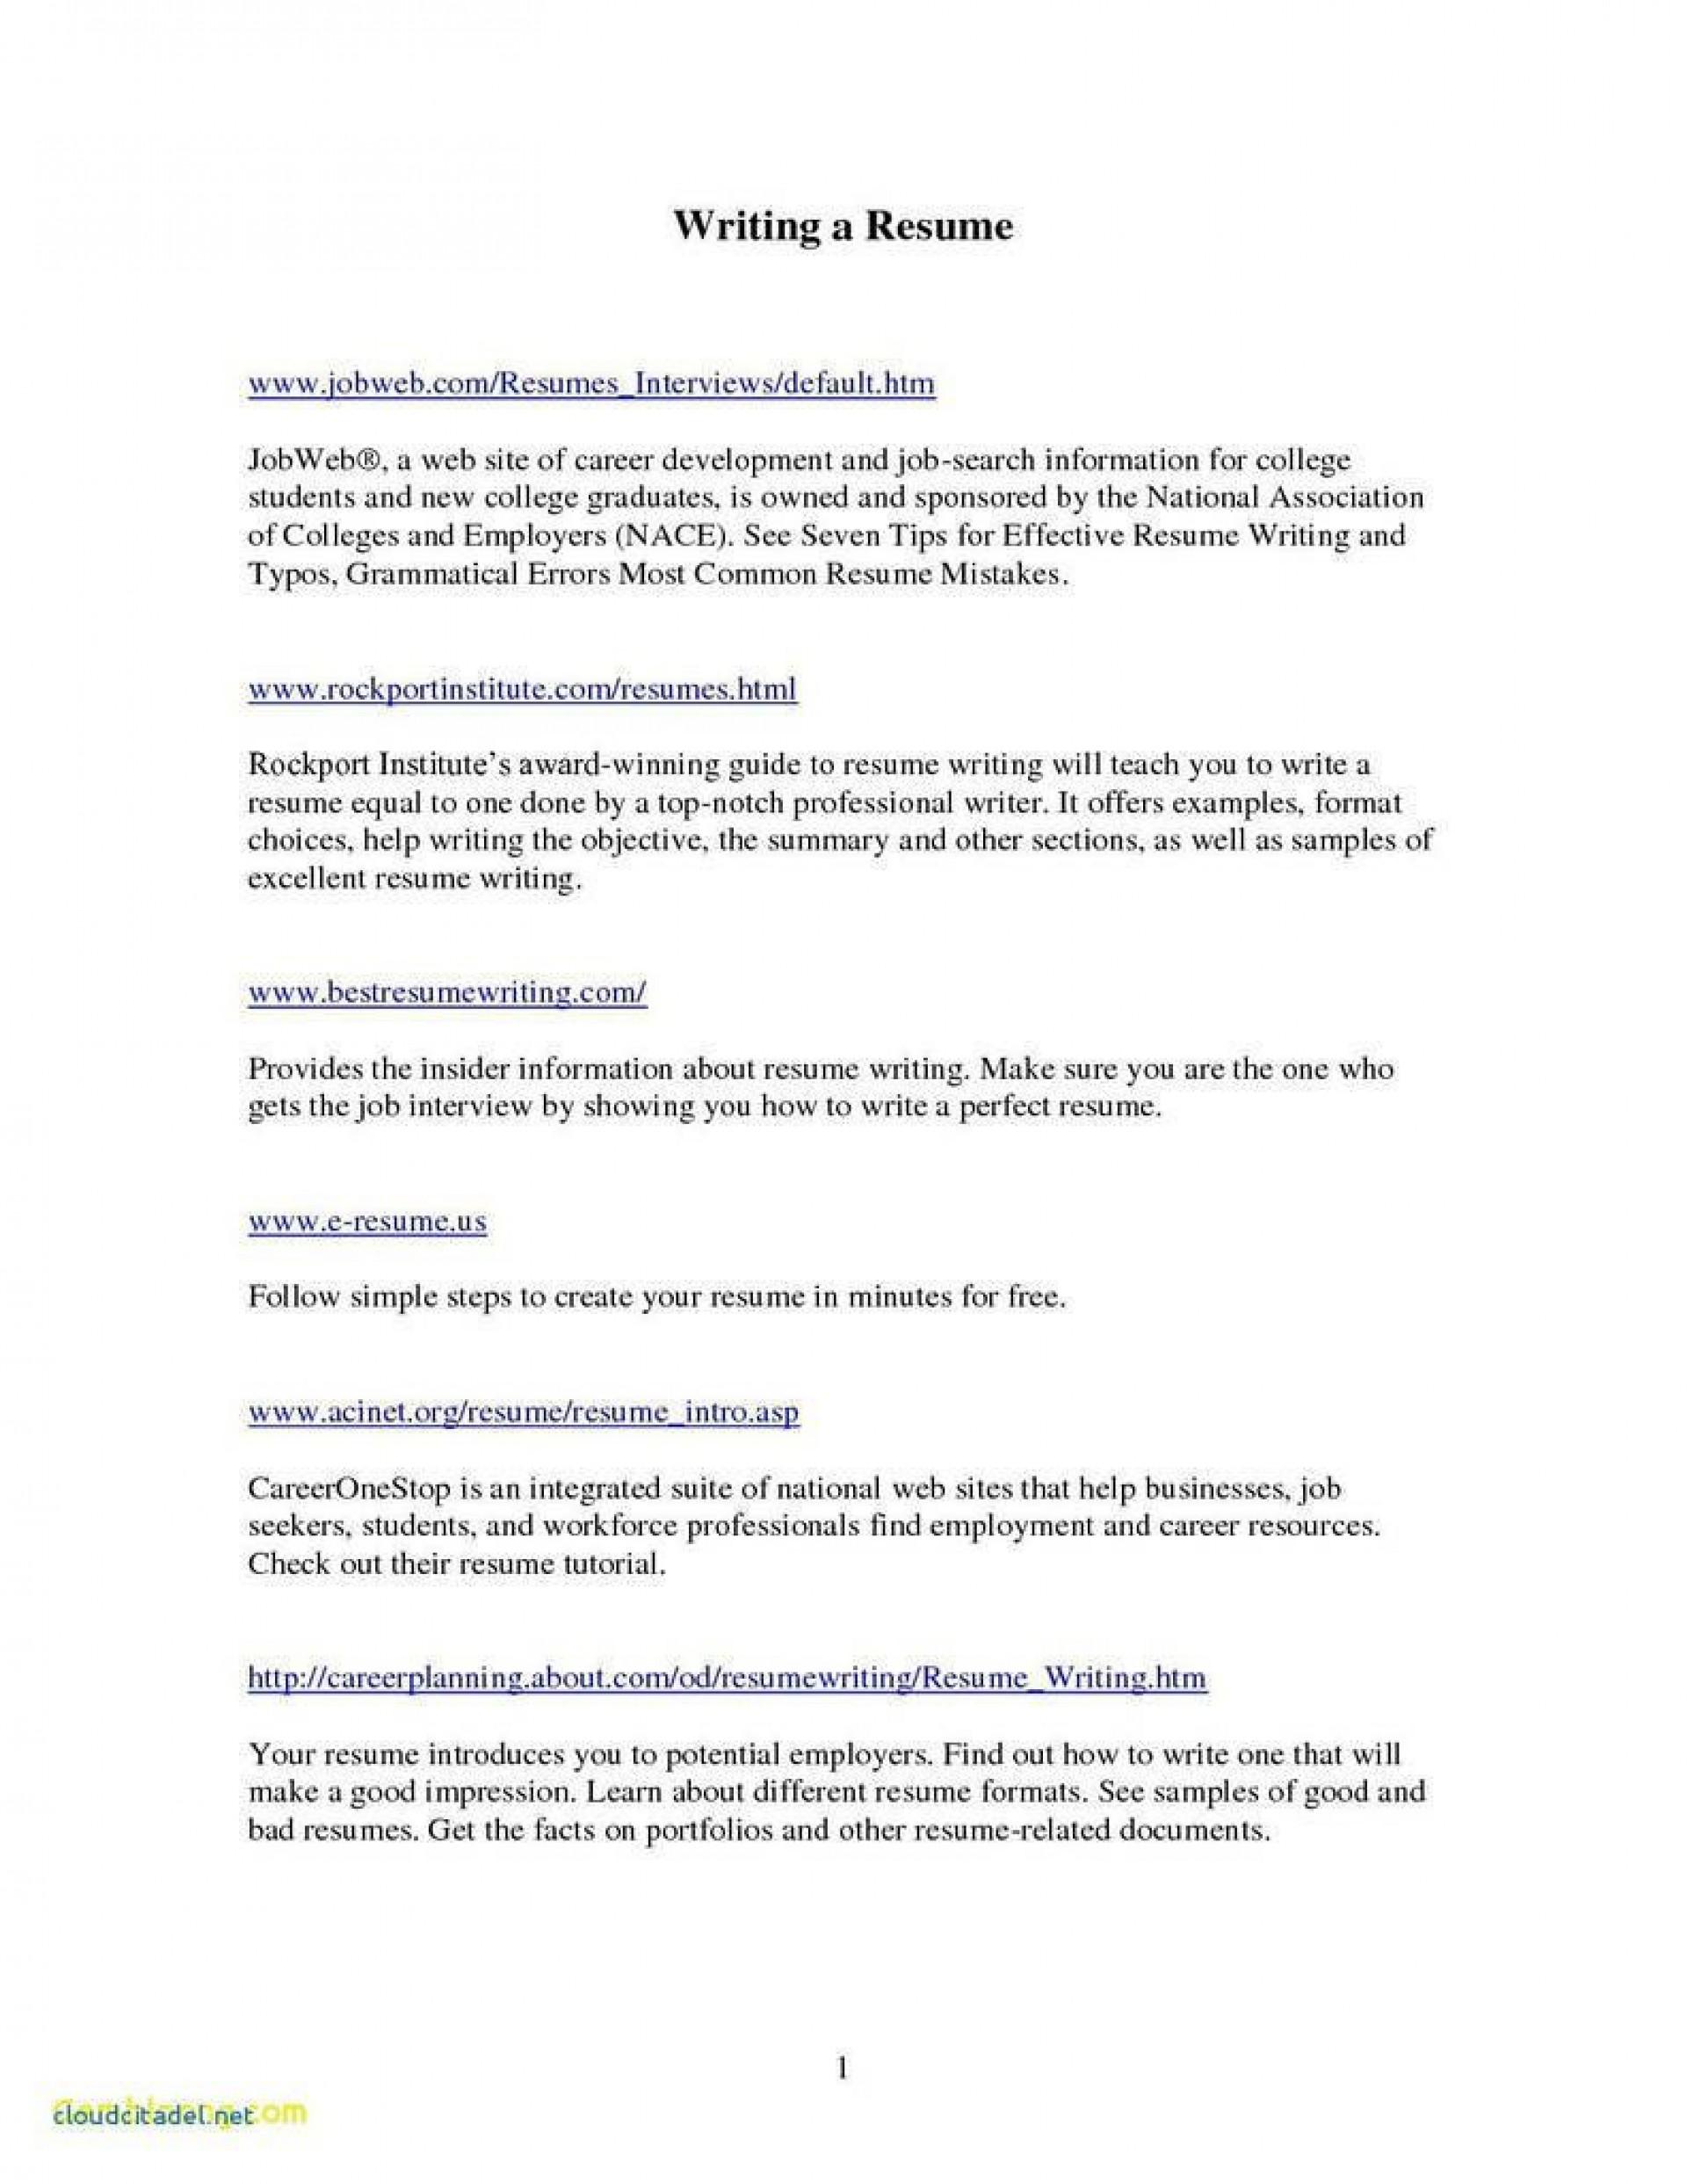 009 Phenomenal Letter Of Understanding Sample Format Inspiration 1920